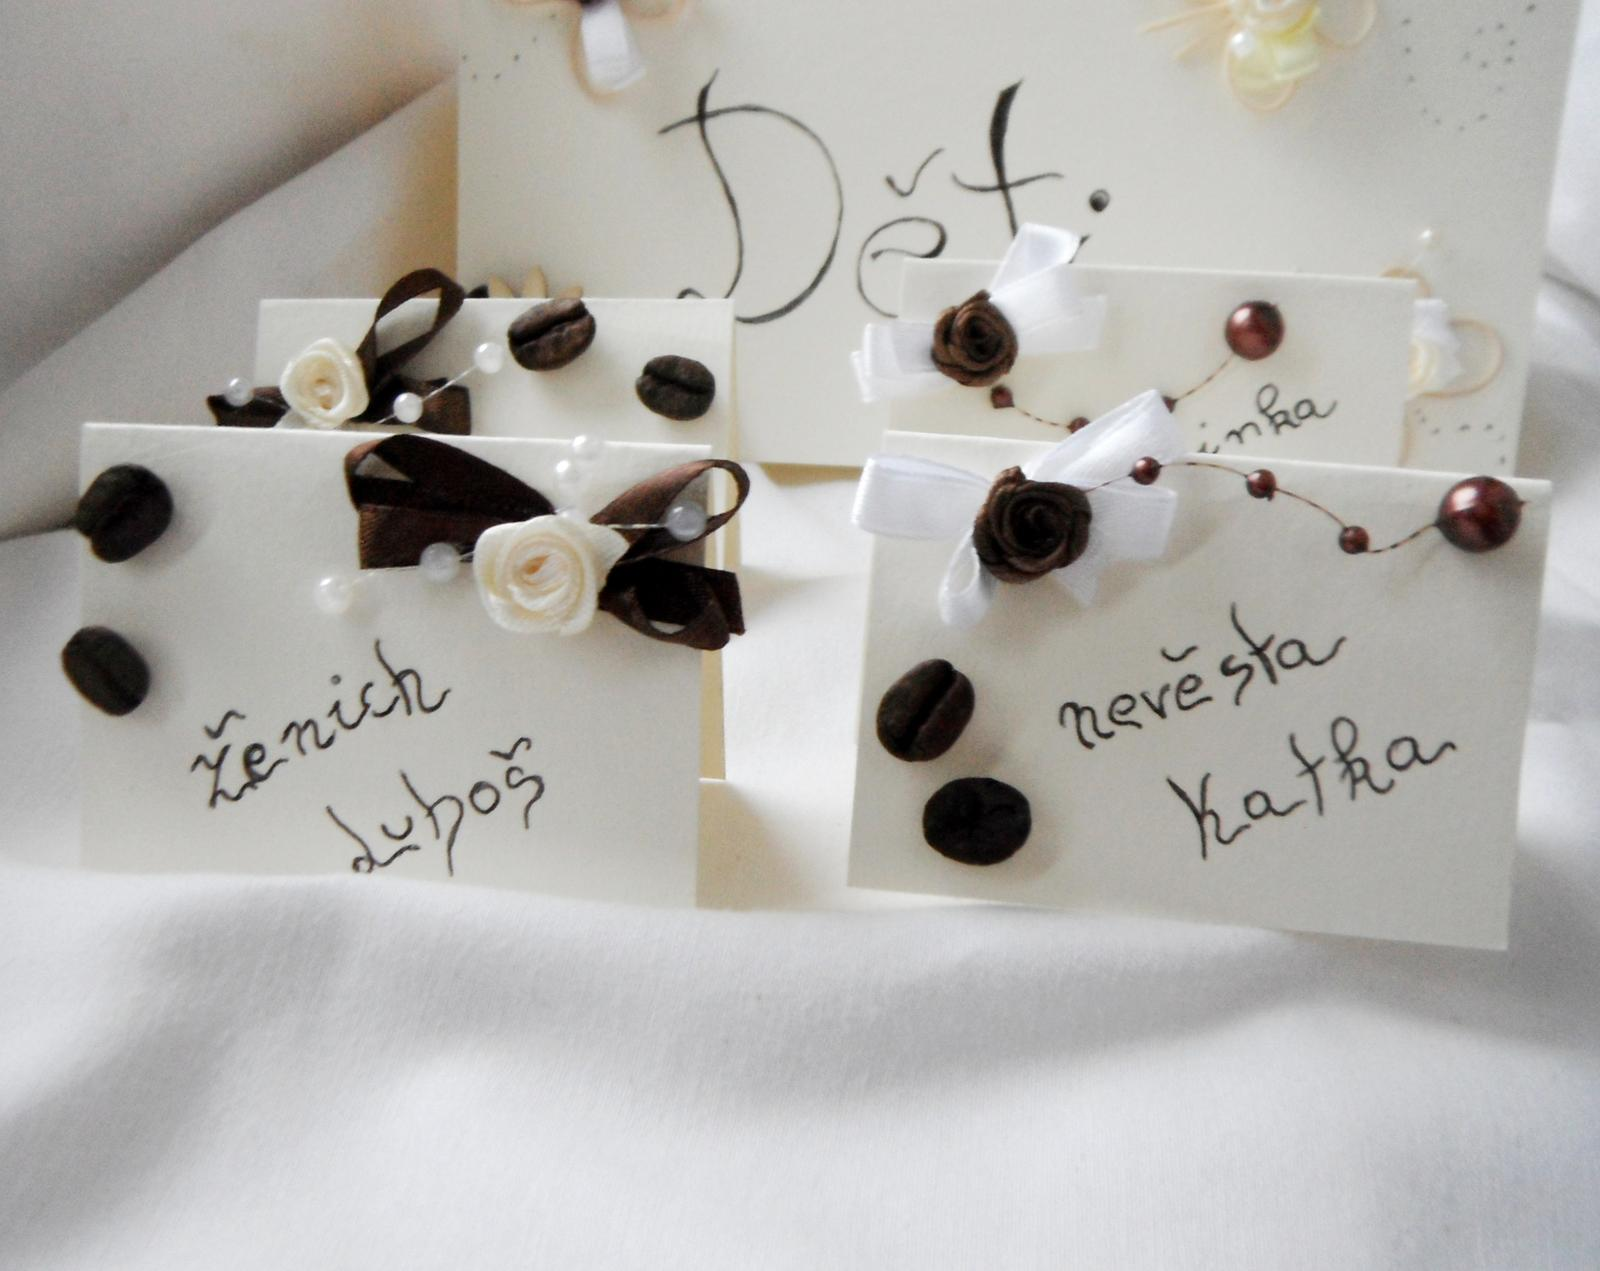 Sada k dekoraci svatebního stolu  -káva - Obrázek č. 3